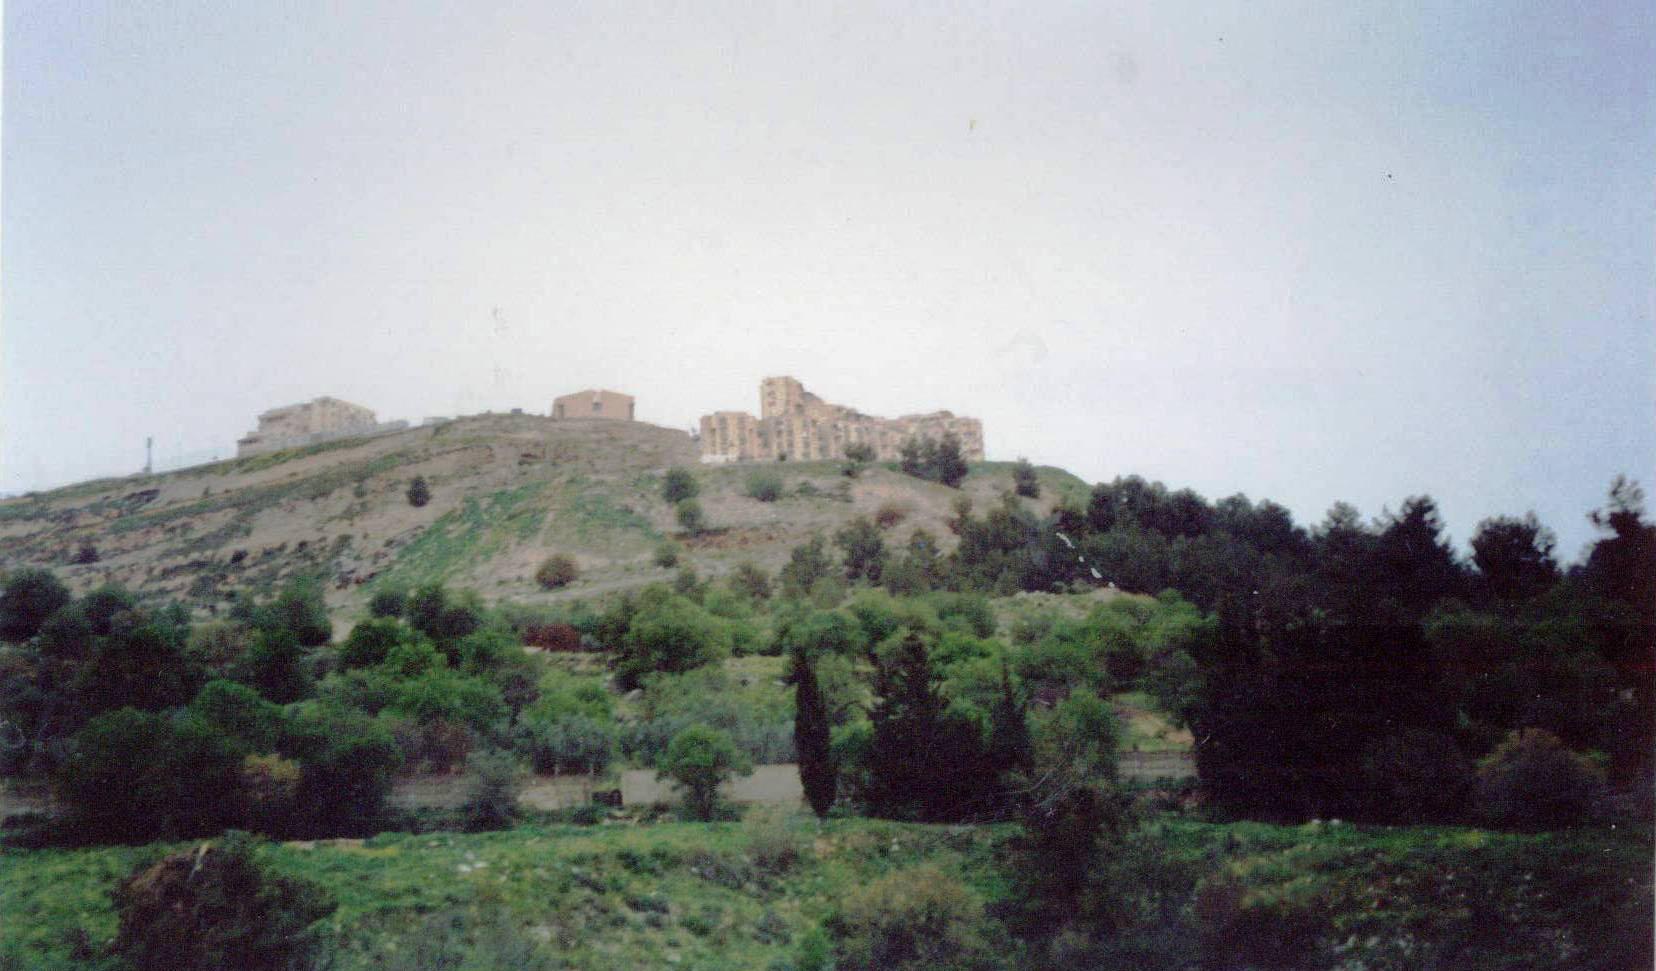 File:PikiWiki Israel 11105 Canaan Chabad.jpg - Wikimedia ...